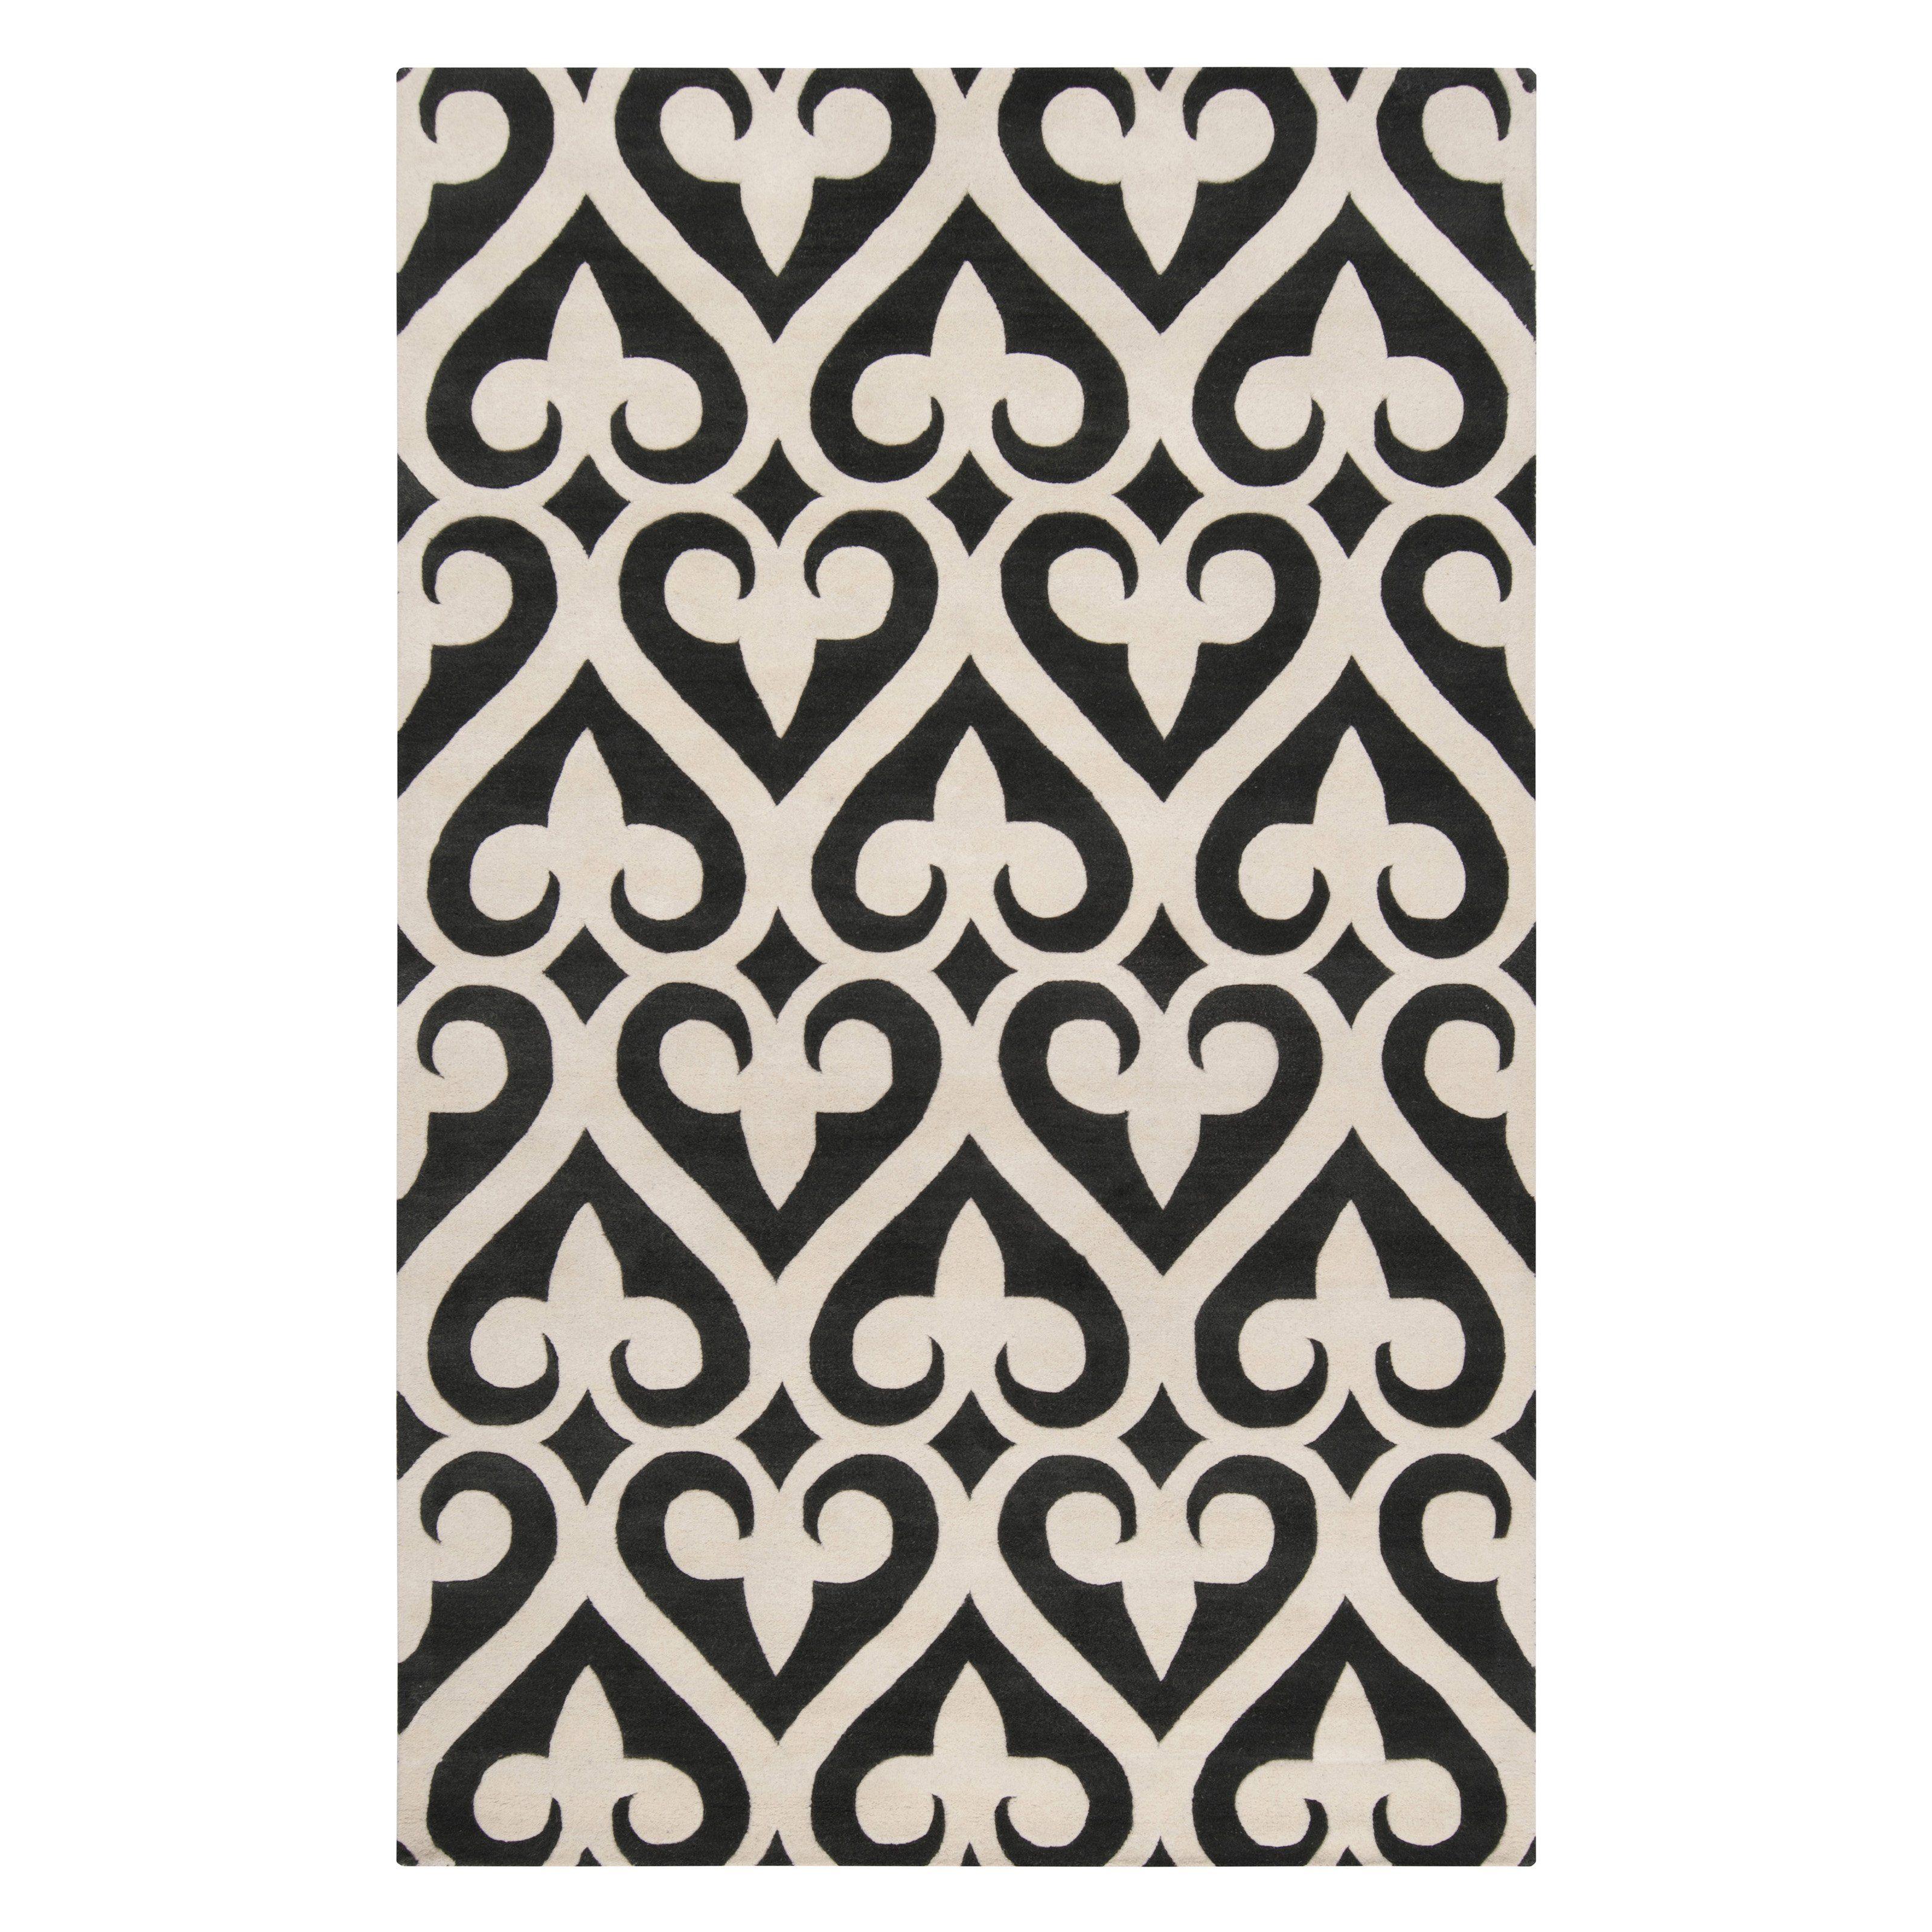 9 x 13 area rugs. Surya ZUN-1048 Jill Rosenwald Area Rug - 9 X 13 Ft. Gray Rugs